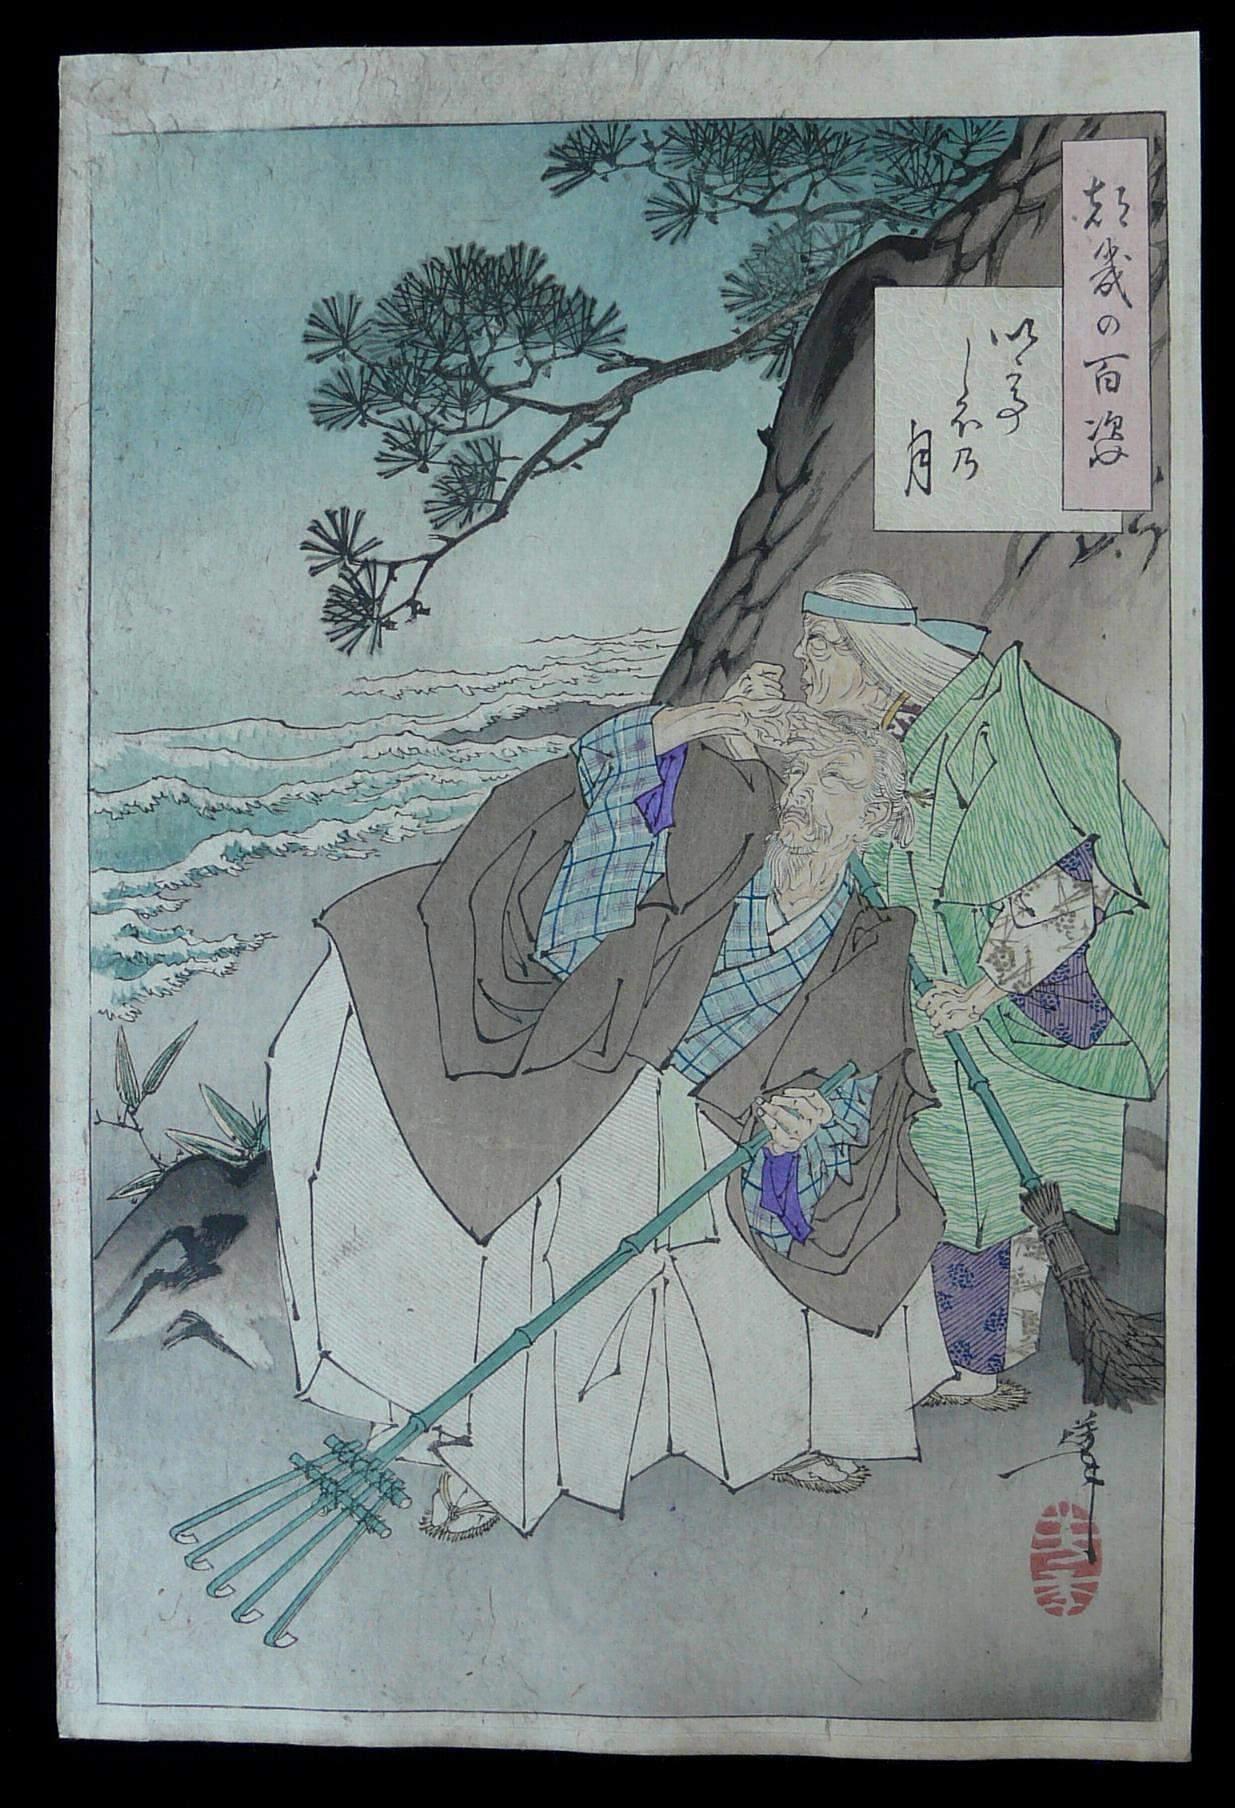 TAISO YOSHITOSHI: #P3336 IDECHIO NO TSUKI - THE MOON AT HIGH TIDE FROM 100 ASPECTS OF THE MOON SERIES